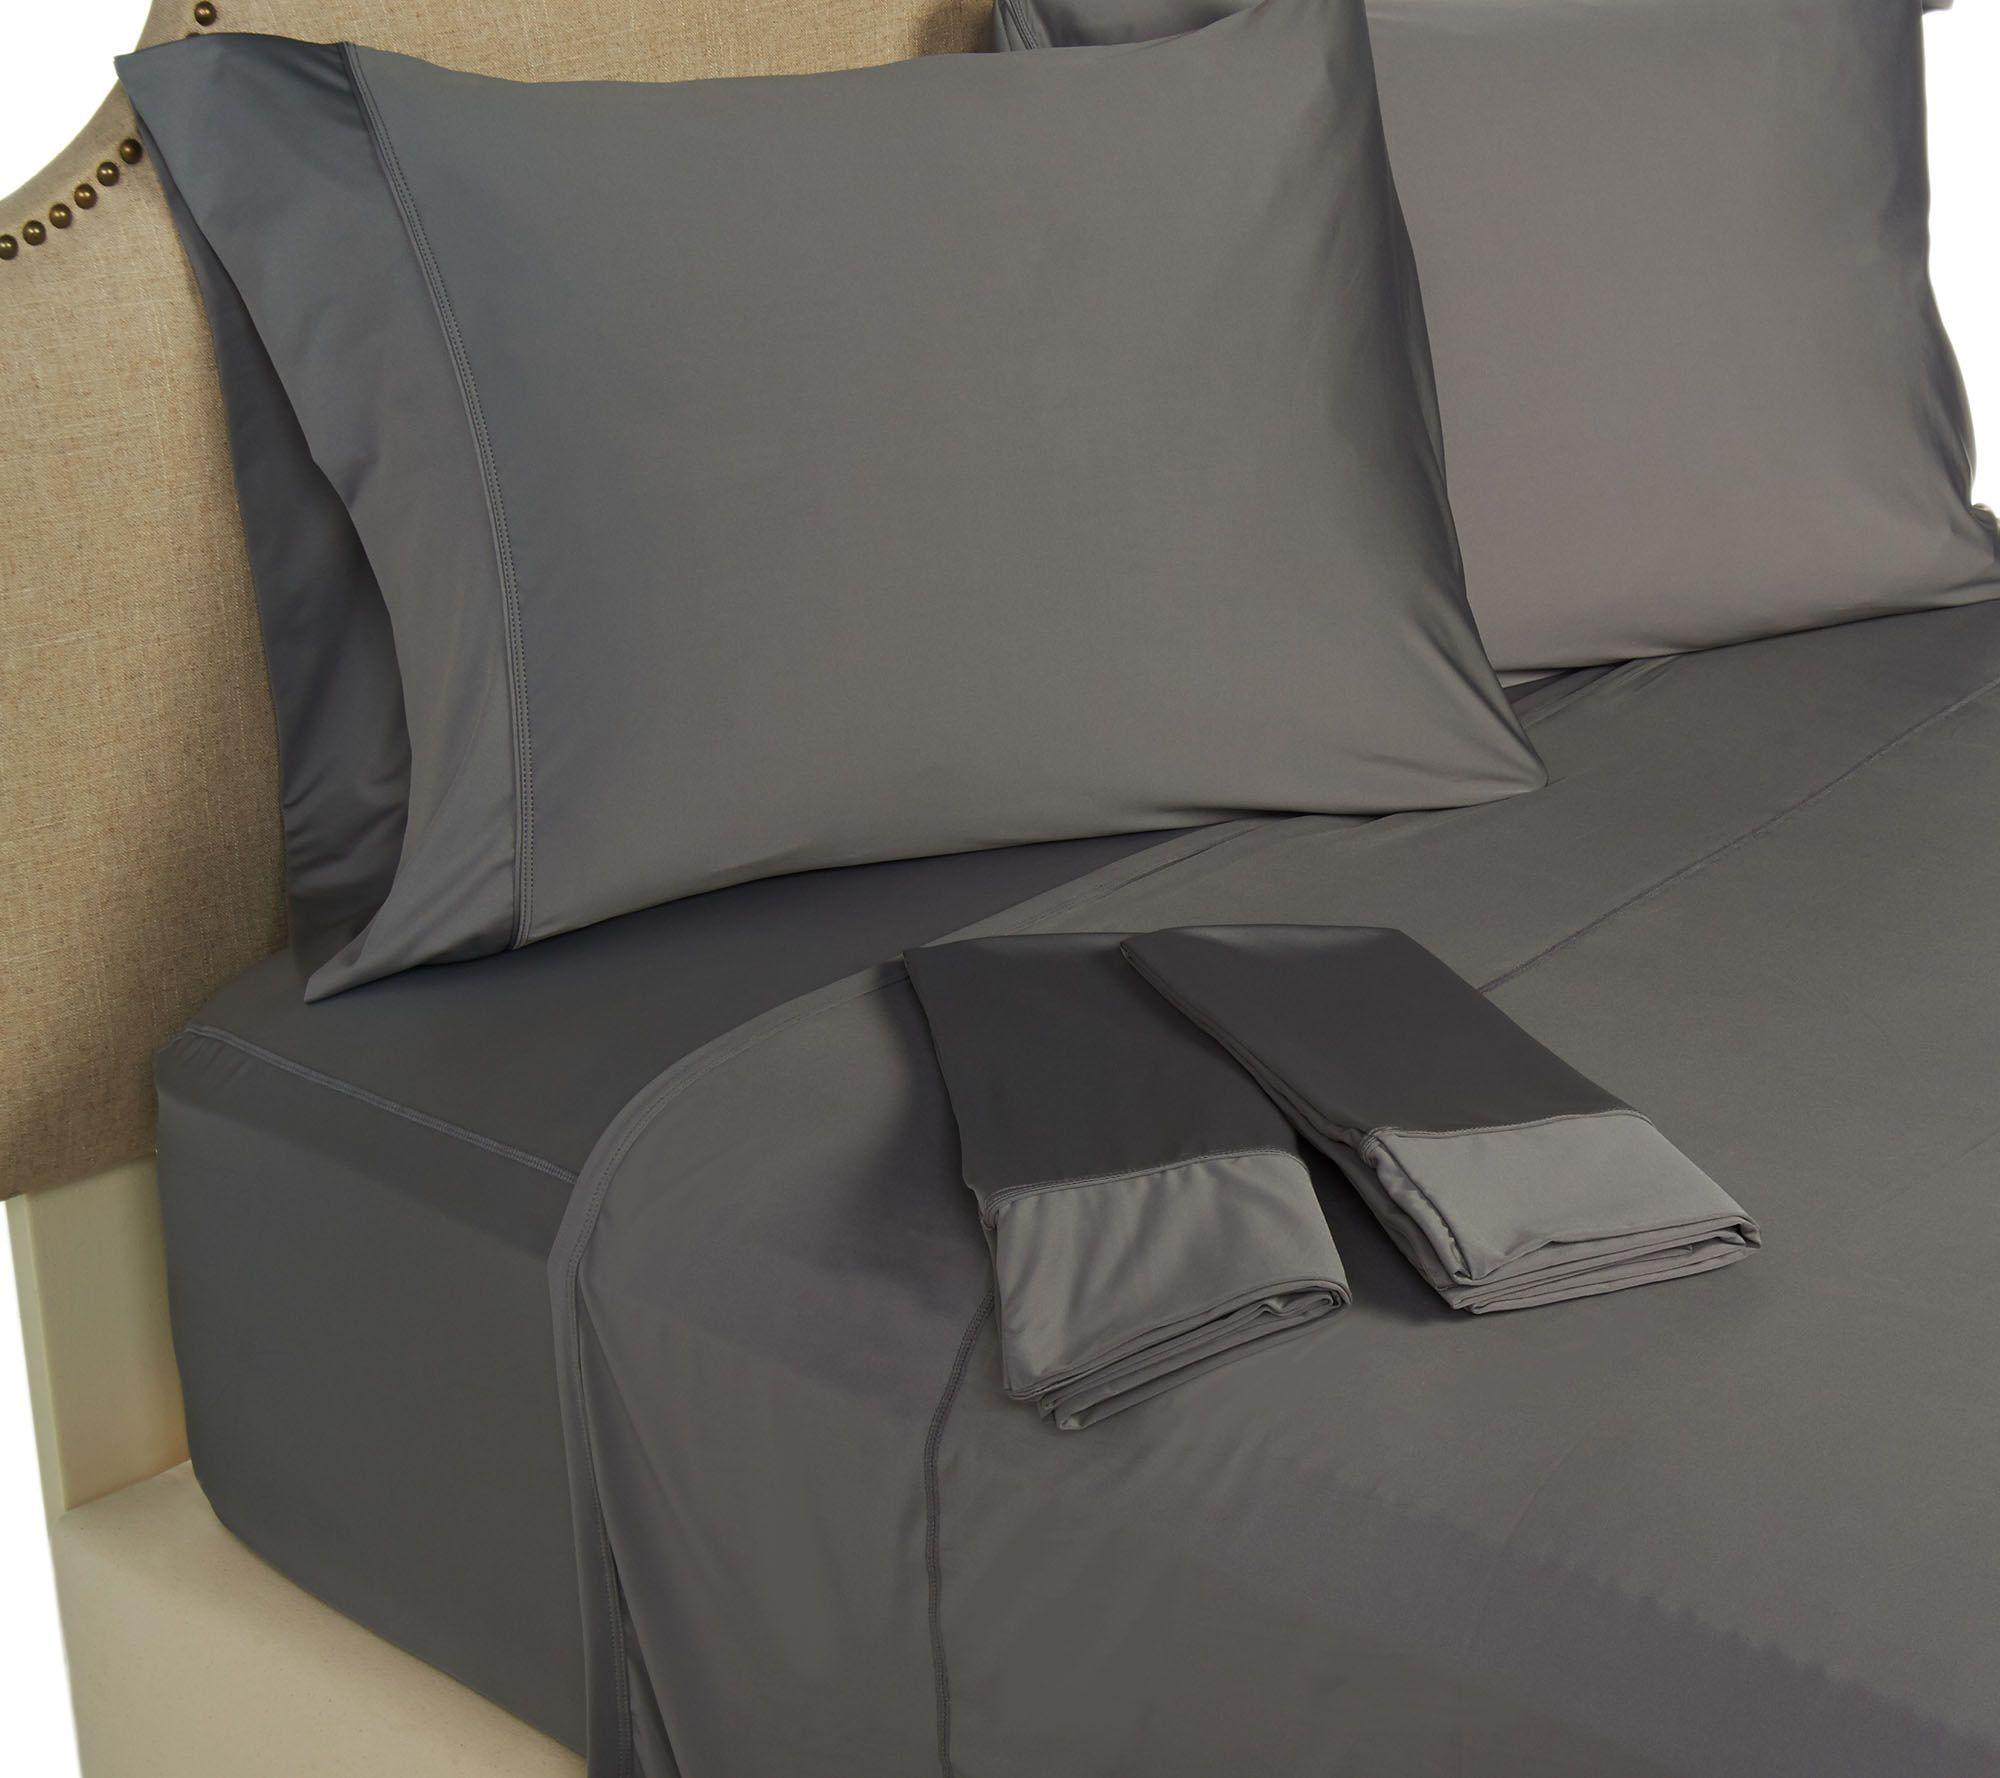 Performance Sheet Set Sheet sets, Bed sheets